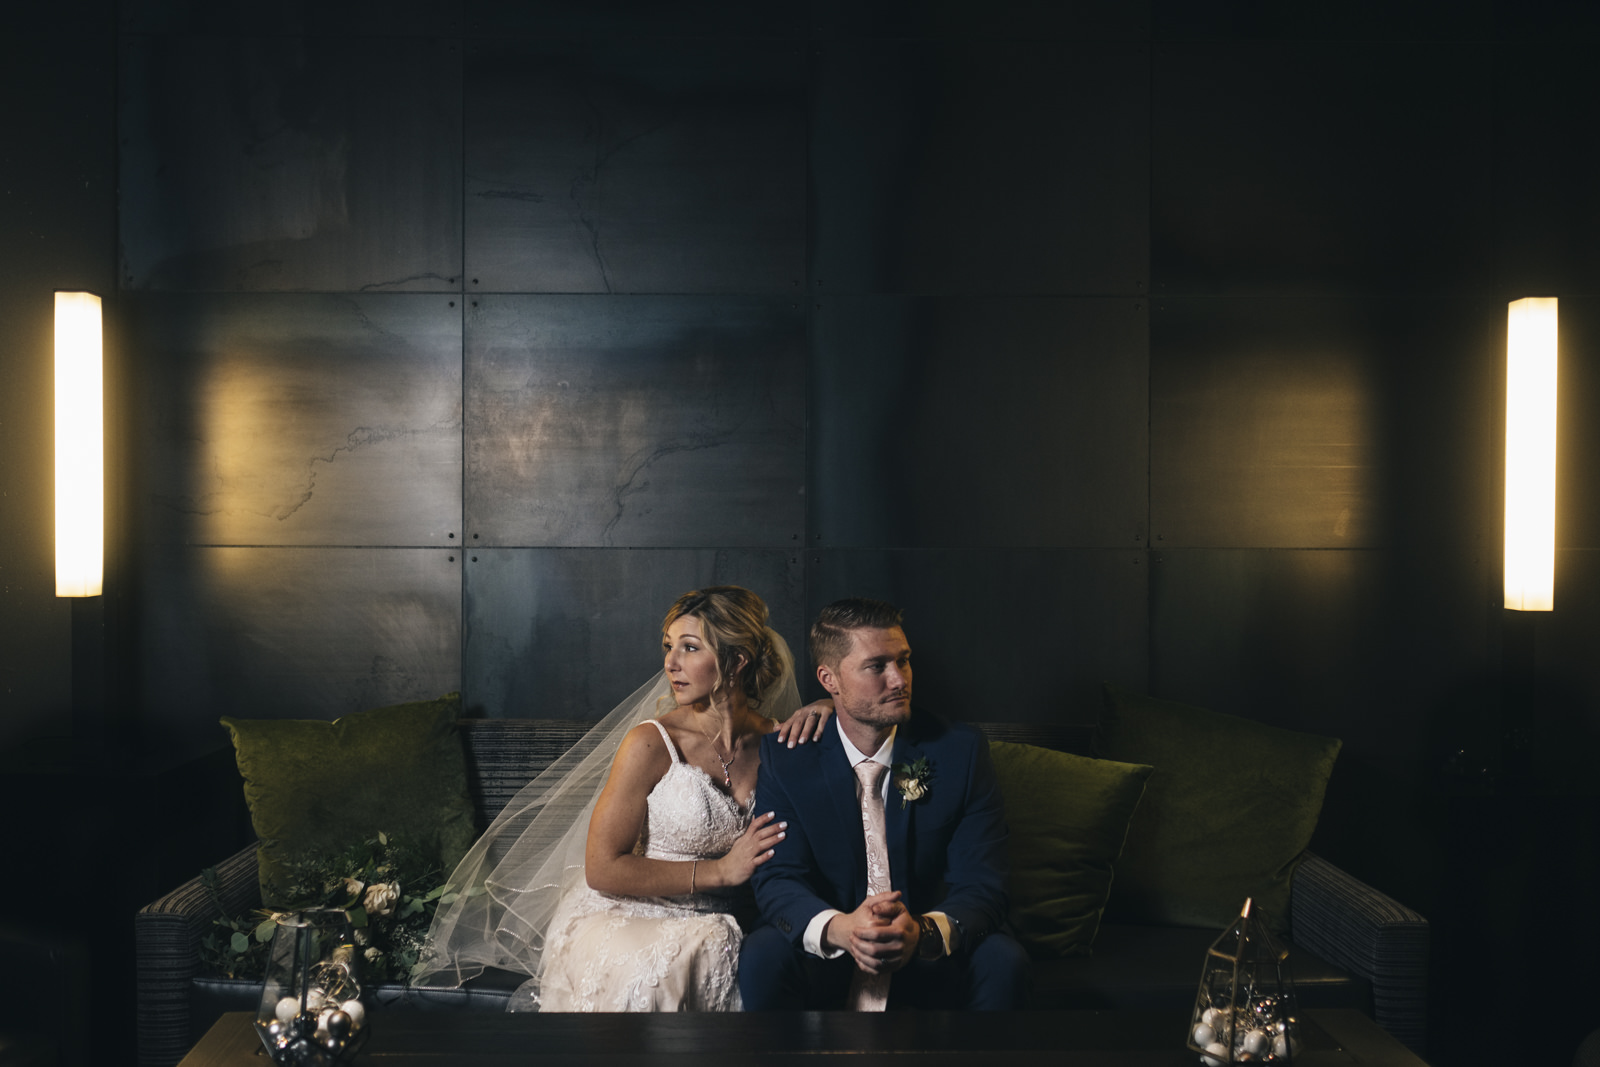 Toledo_Wedding_Portrait_at_Renaissance_Hotel.jpg